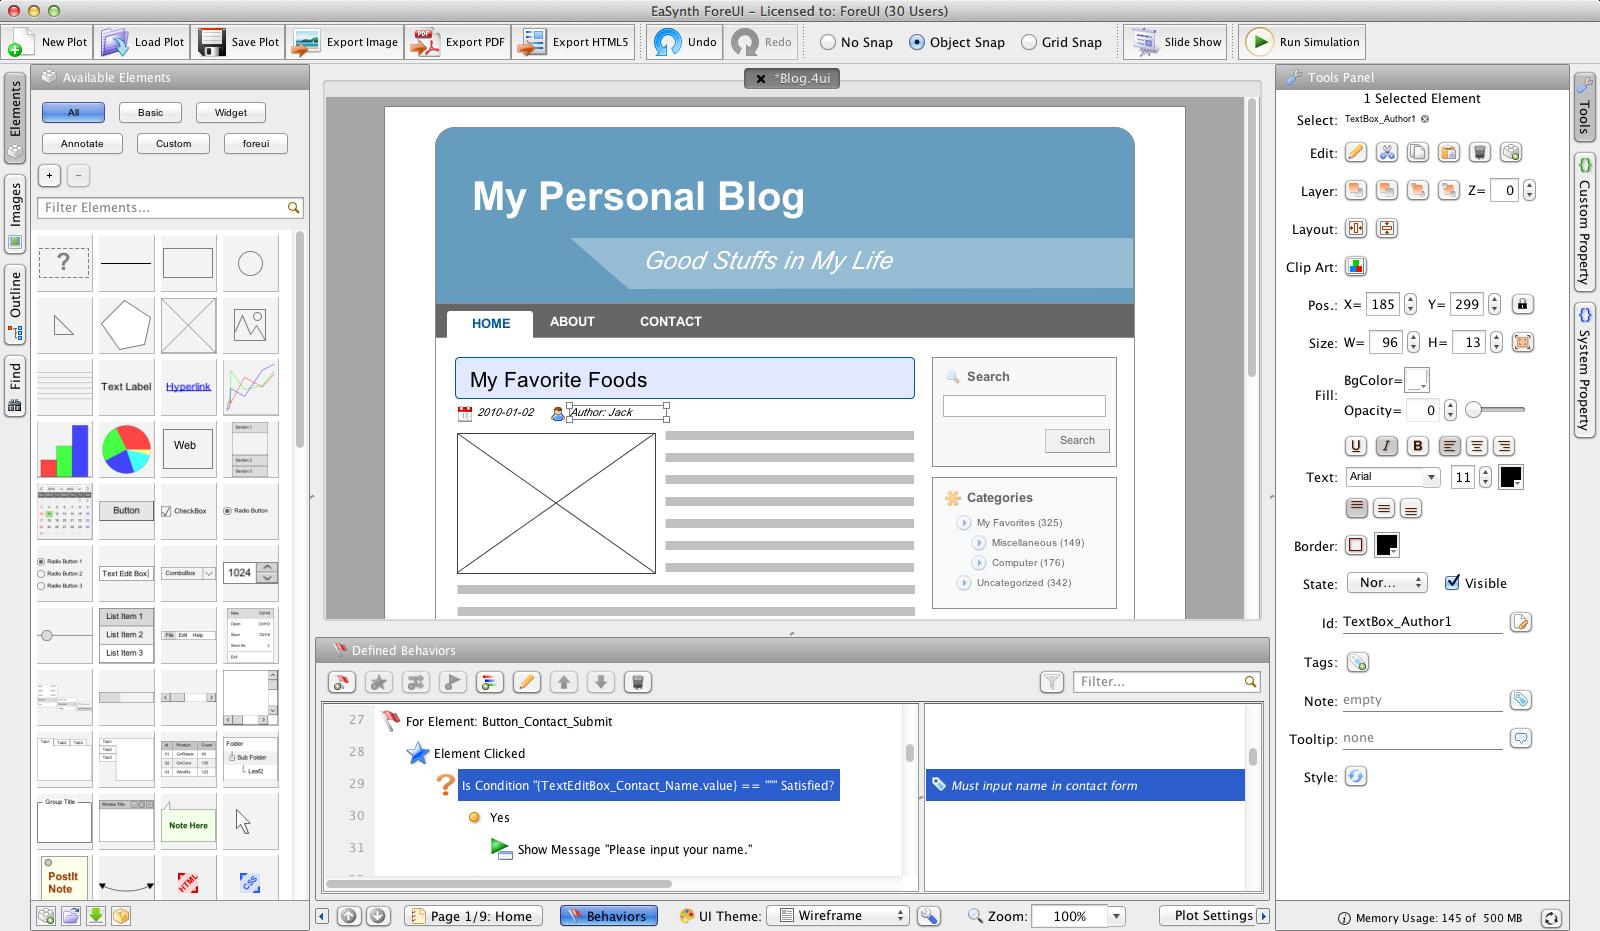 ForeUI GUI Prototyping Tool Screenshot